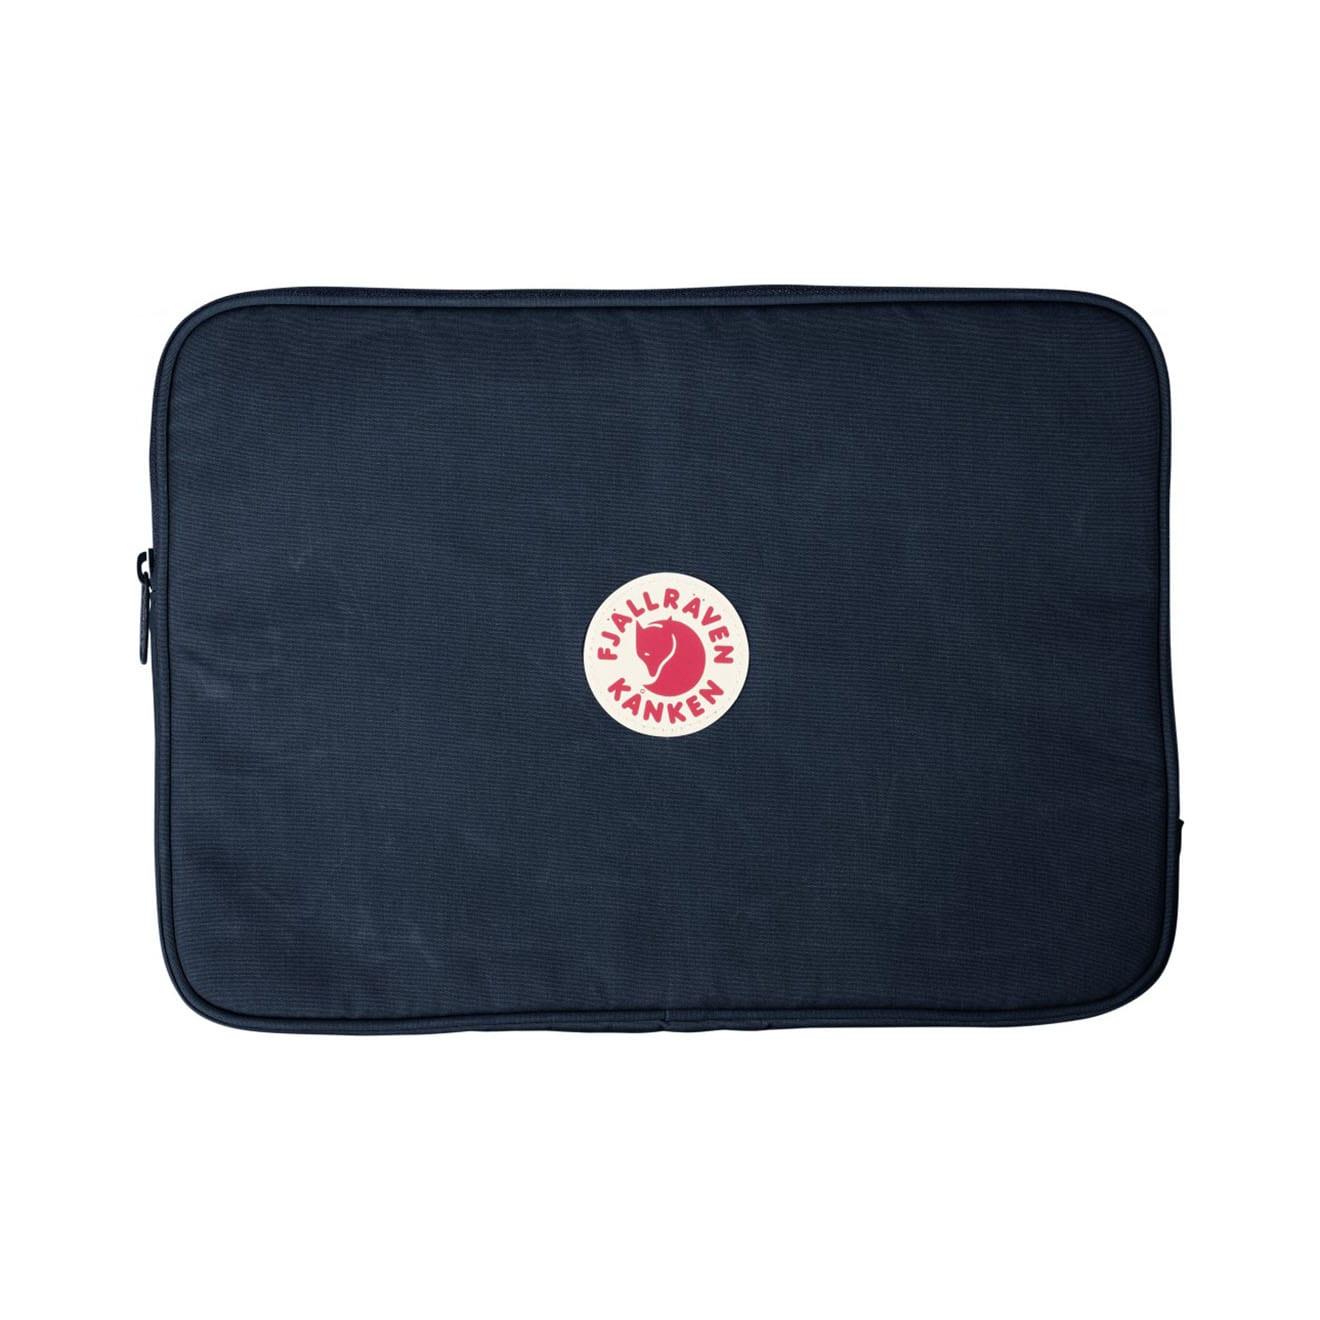 "Fjallraven Kanken 13"" Laptop Case Navy"